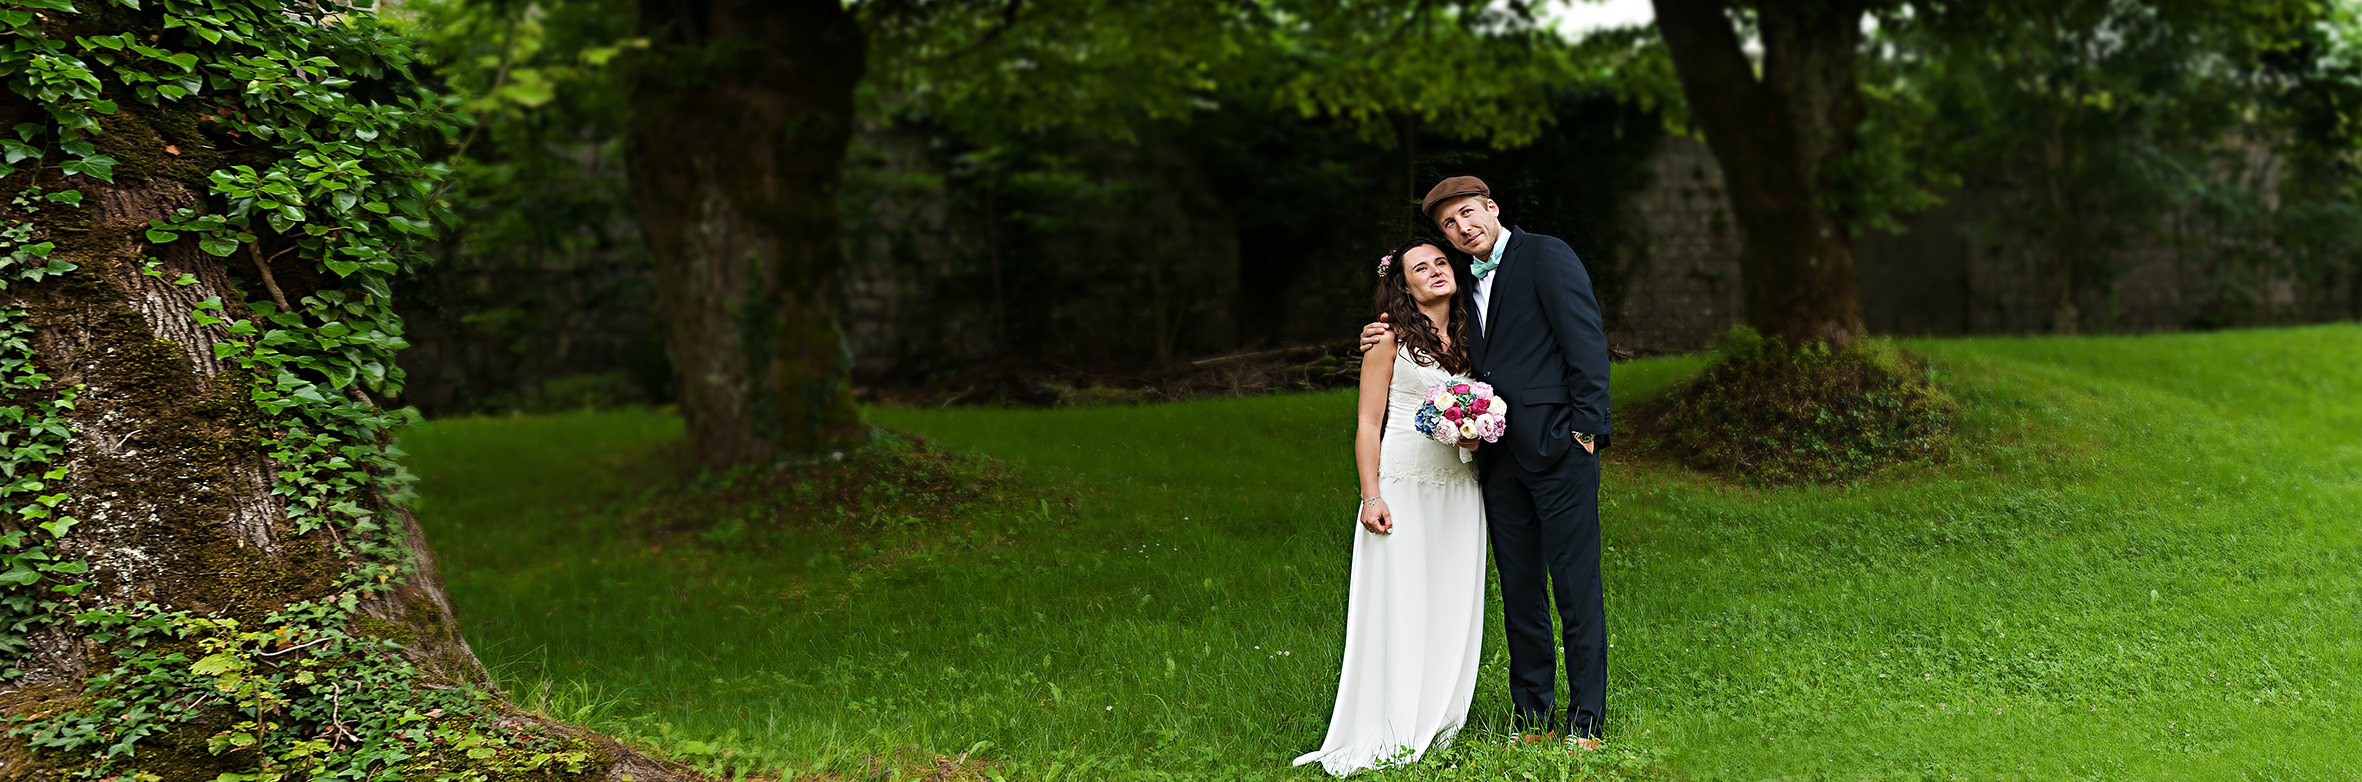 Pano_couple_Charlotte&Arnaud_6